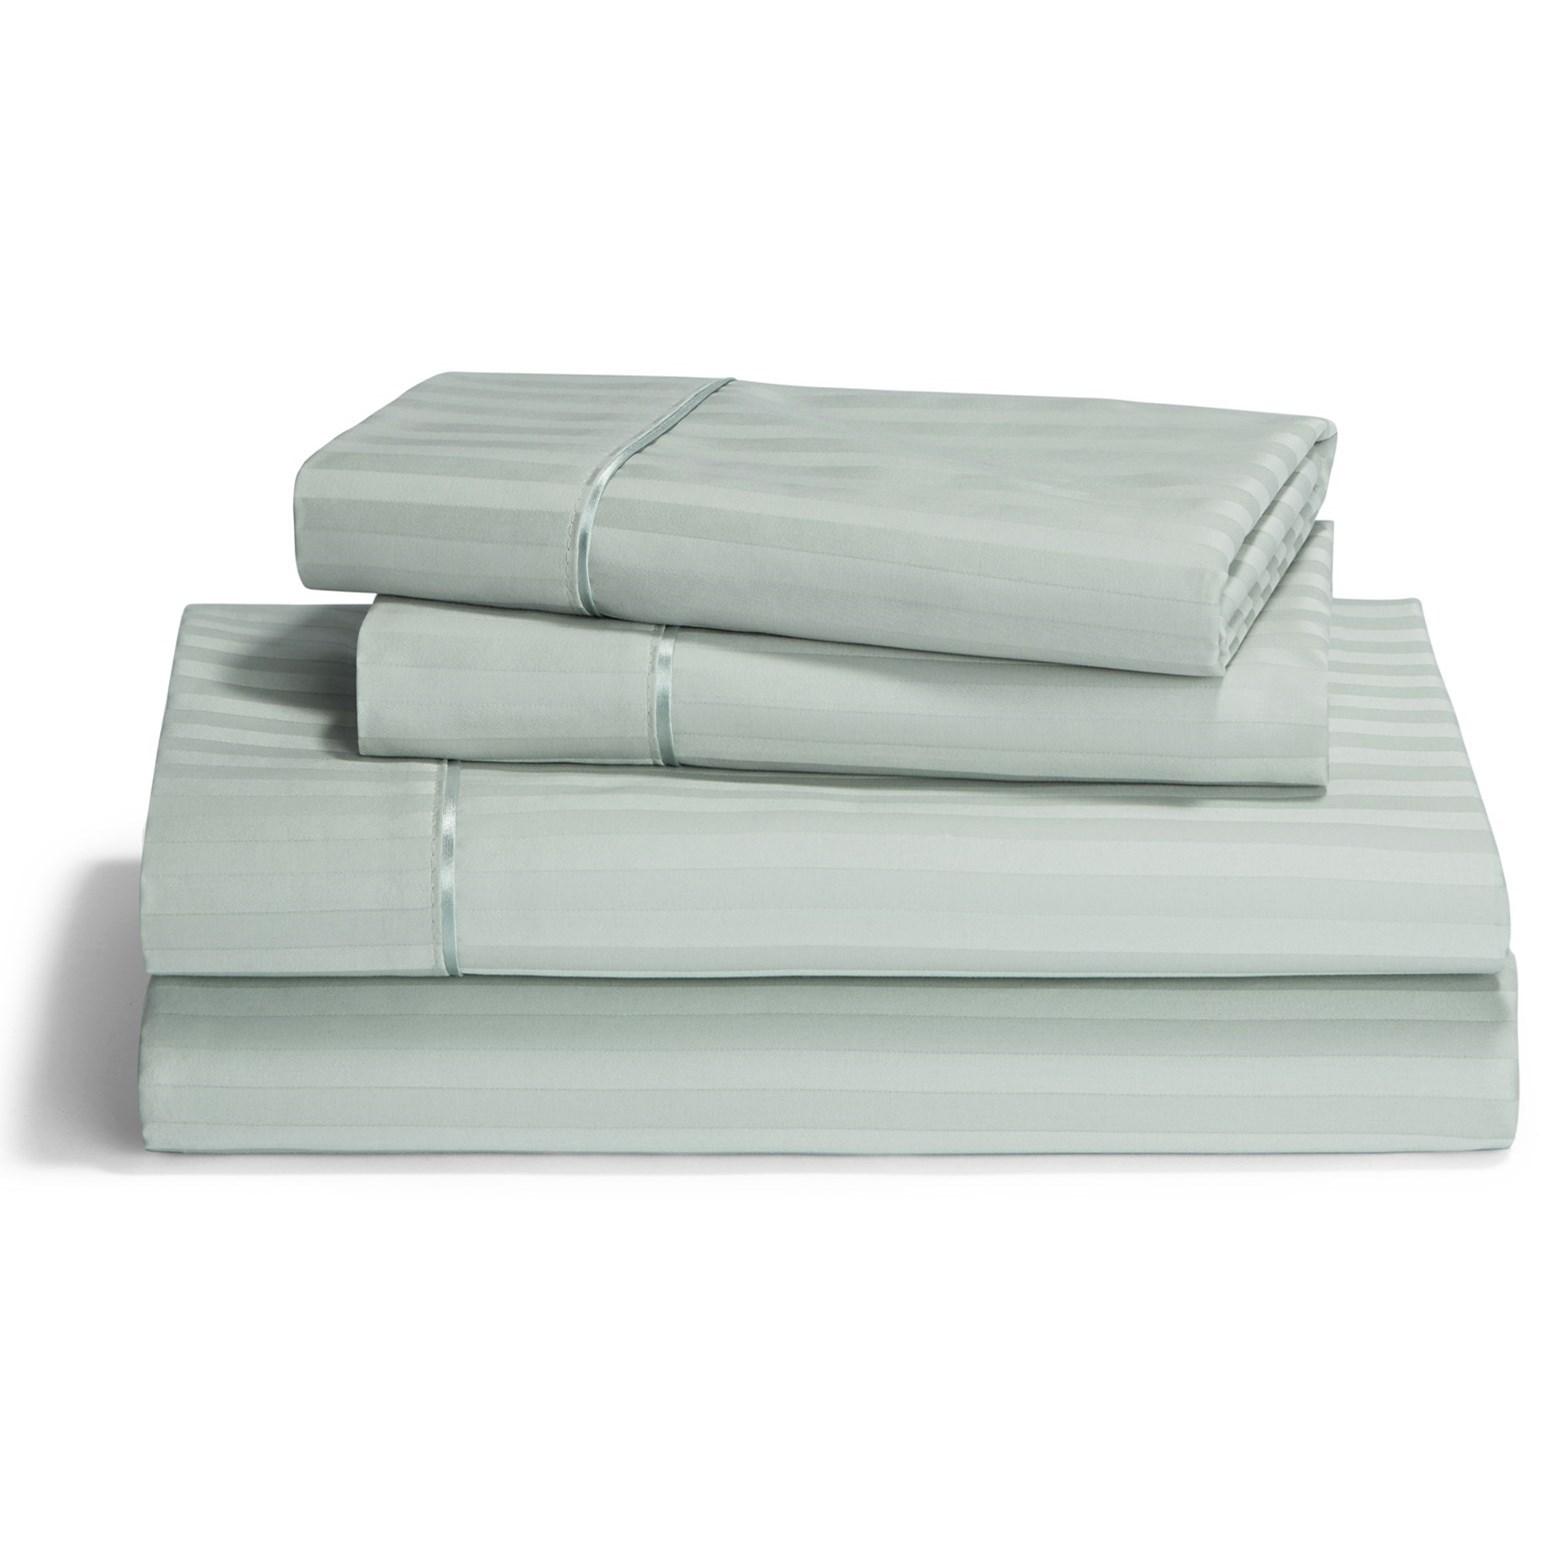 Egyptian Cotton Sheet Sets Split King Pale Green Egyp Cotton Sheet Set by Tempur-Pedic® at Sparks HomeStore